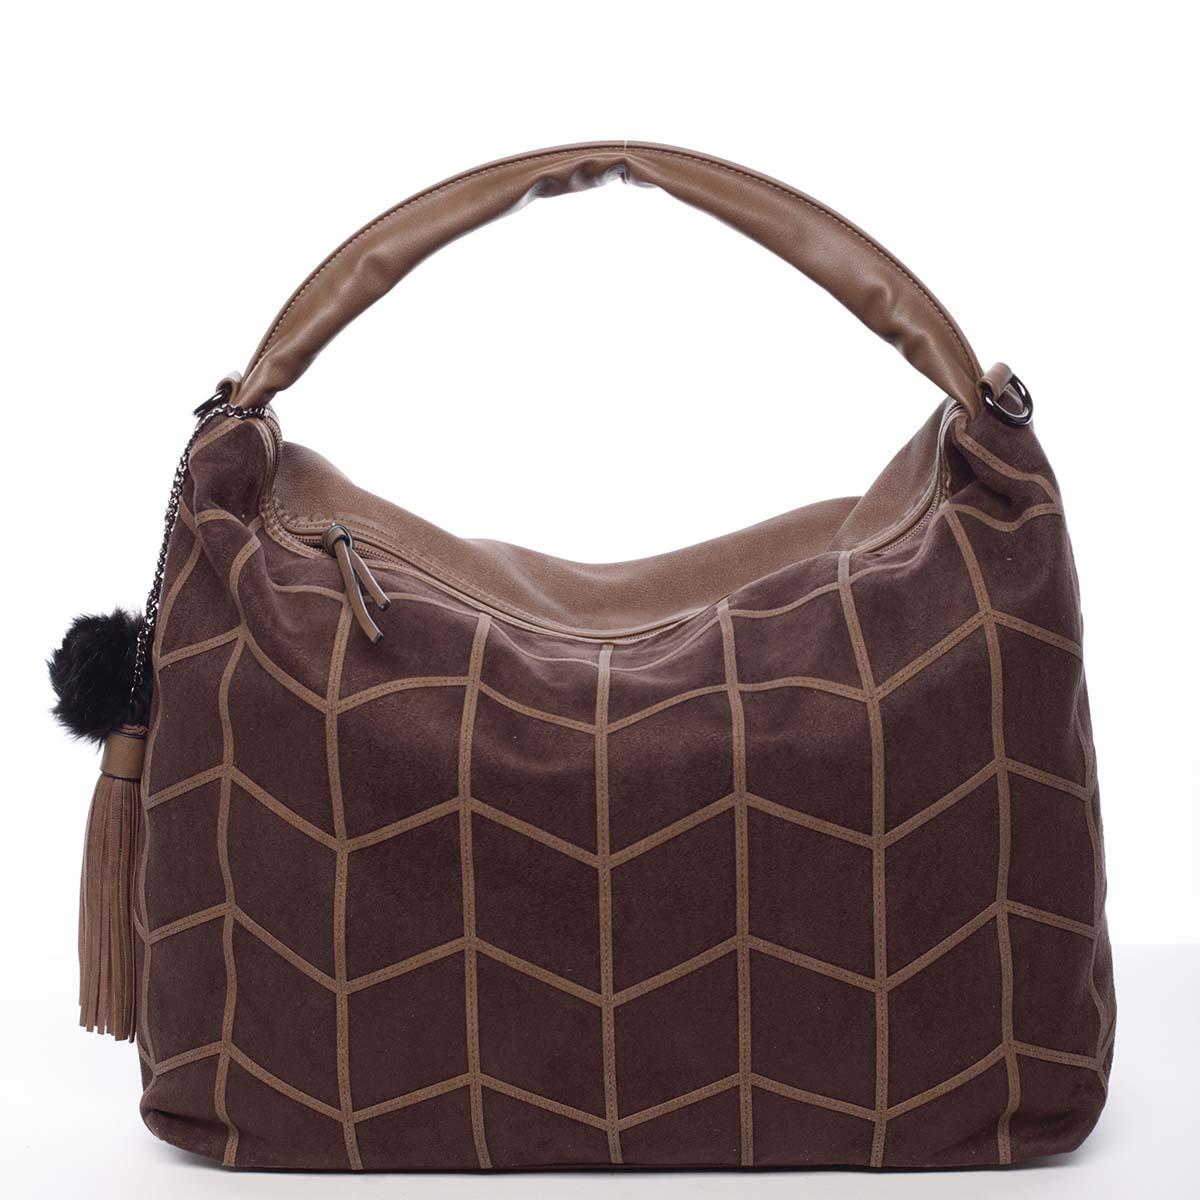 Trendy dámská velká vzorovaná kabelka kávová - MARIA C Chana